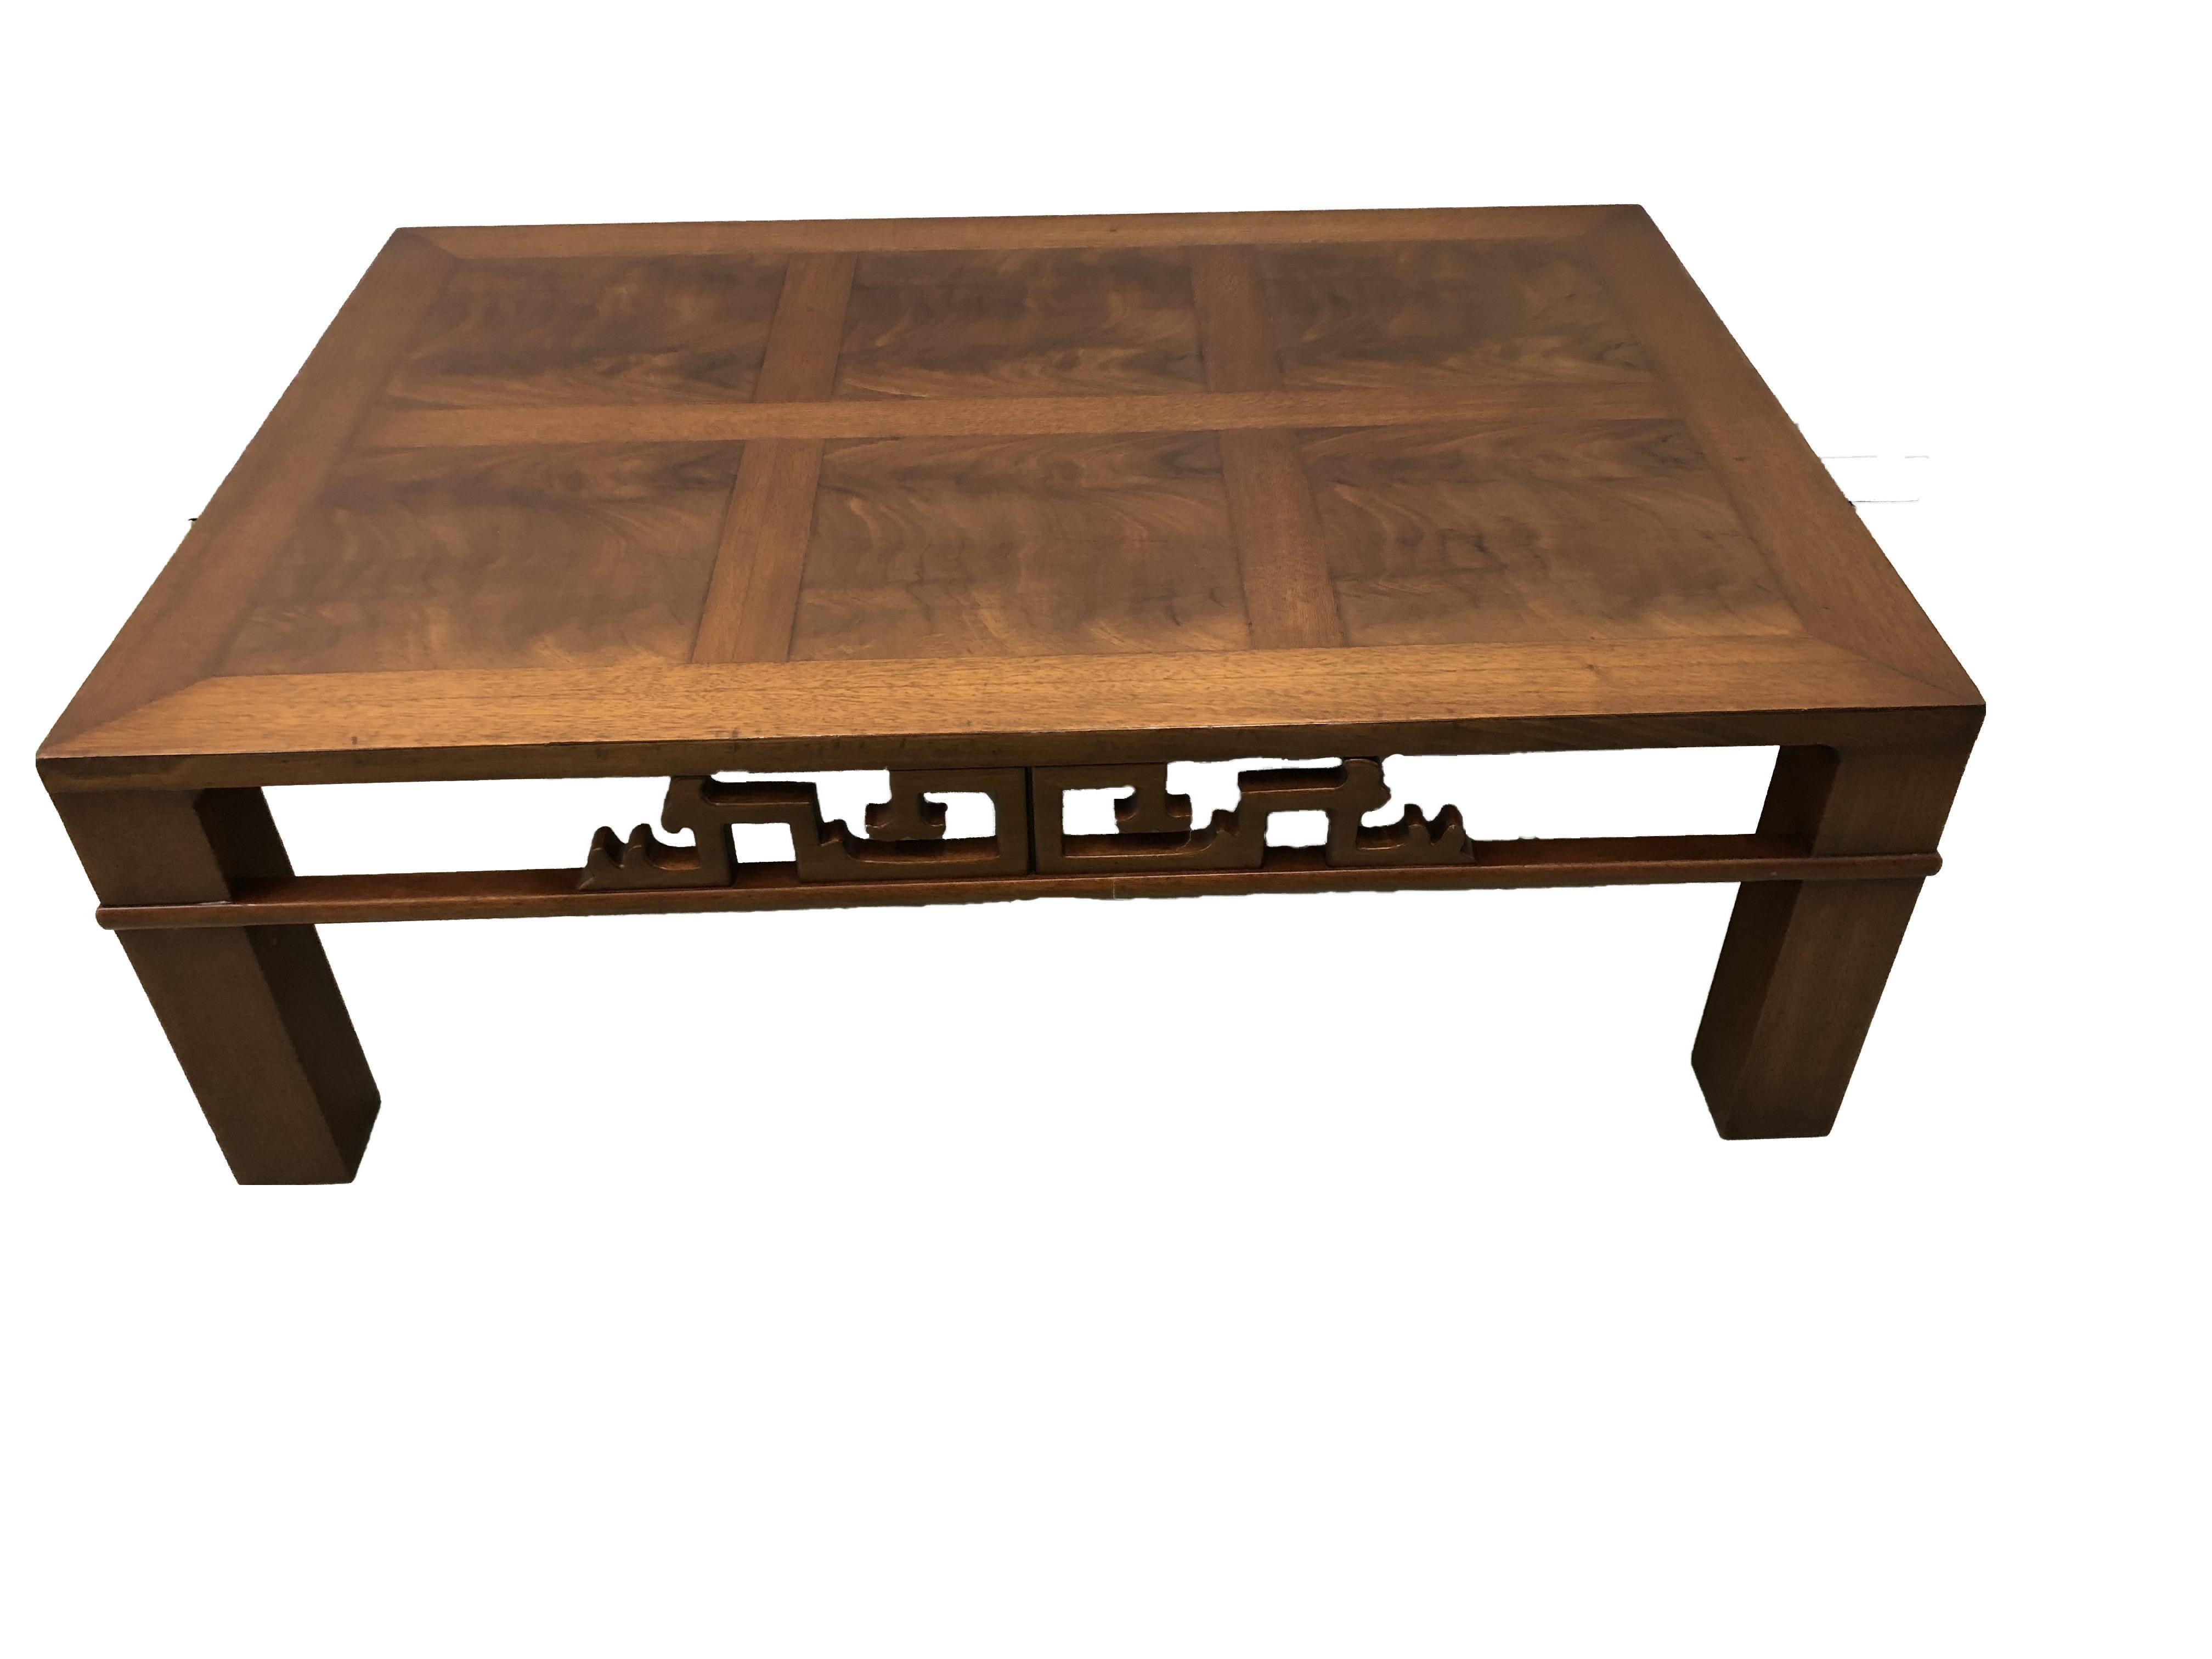 1990s Mid Century Modern Heritage Henredon Mahogany Coffee Table Chairish